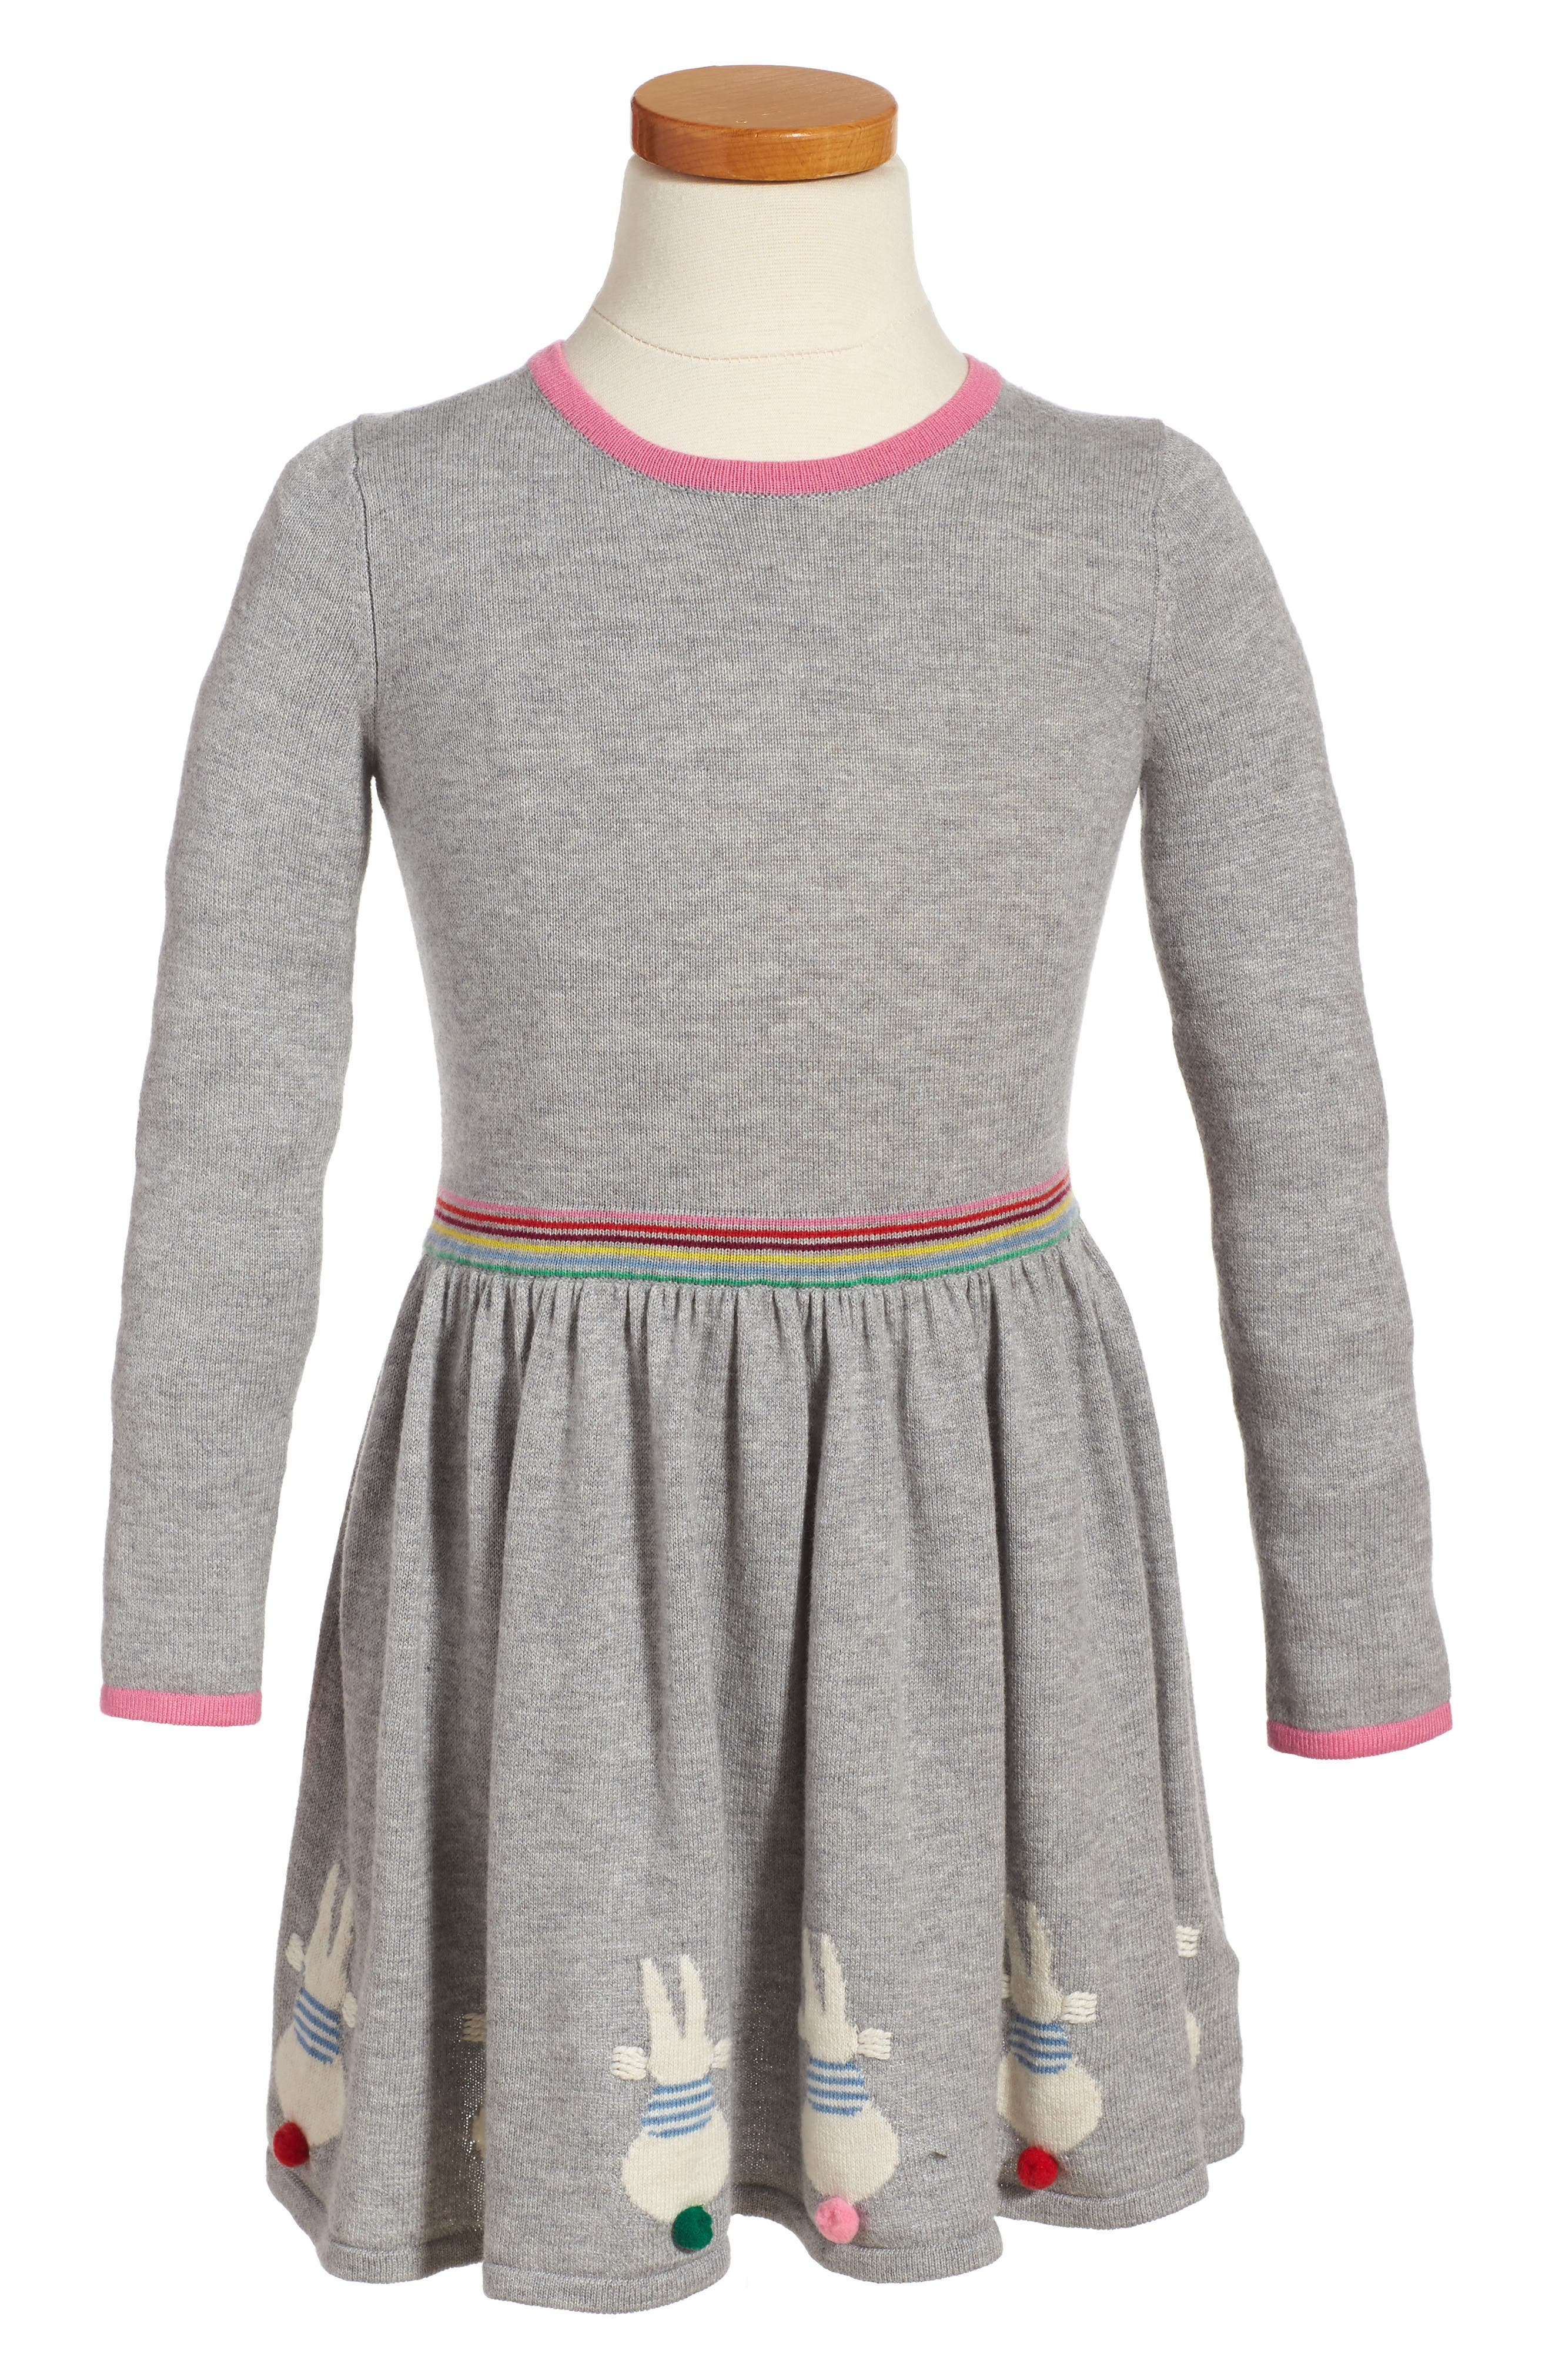 MIni Boden Bunny Sweater Dress (Toddler Girls, Little Girls & Big Girls)